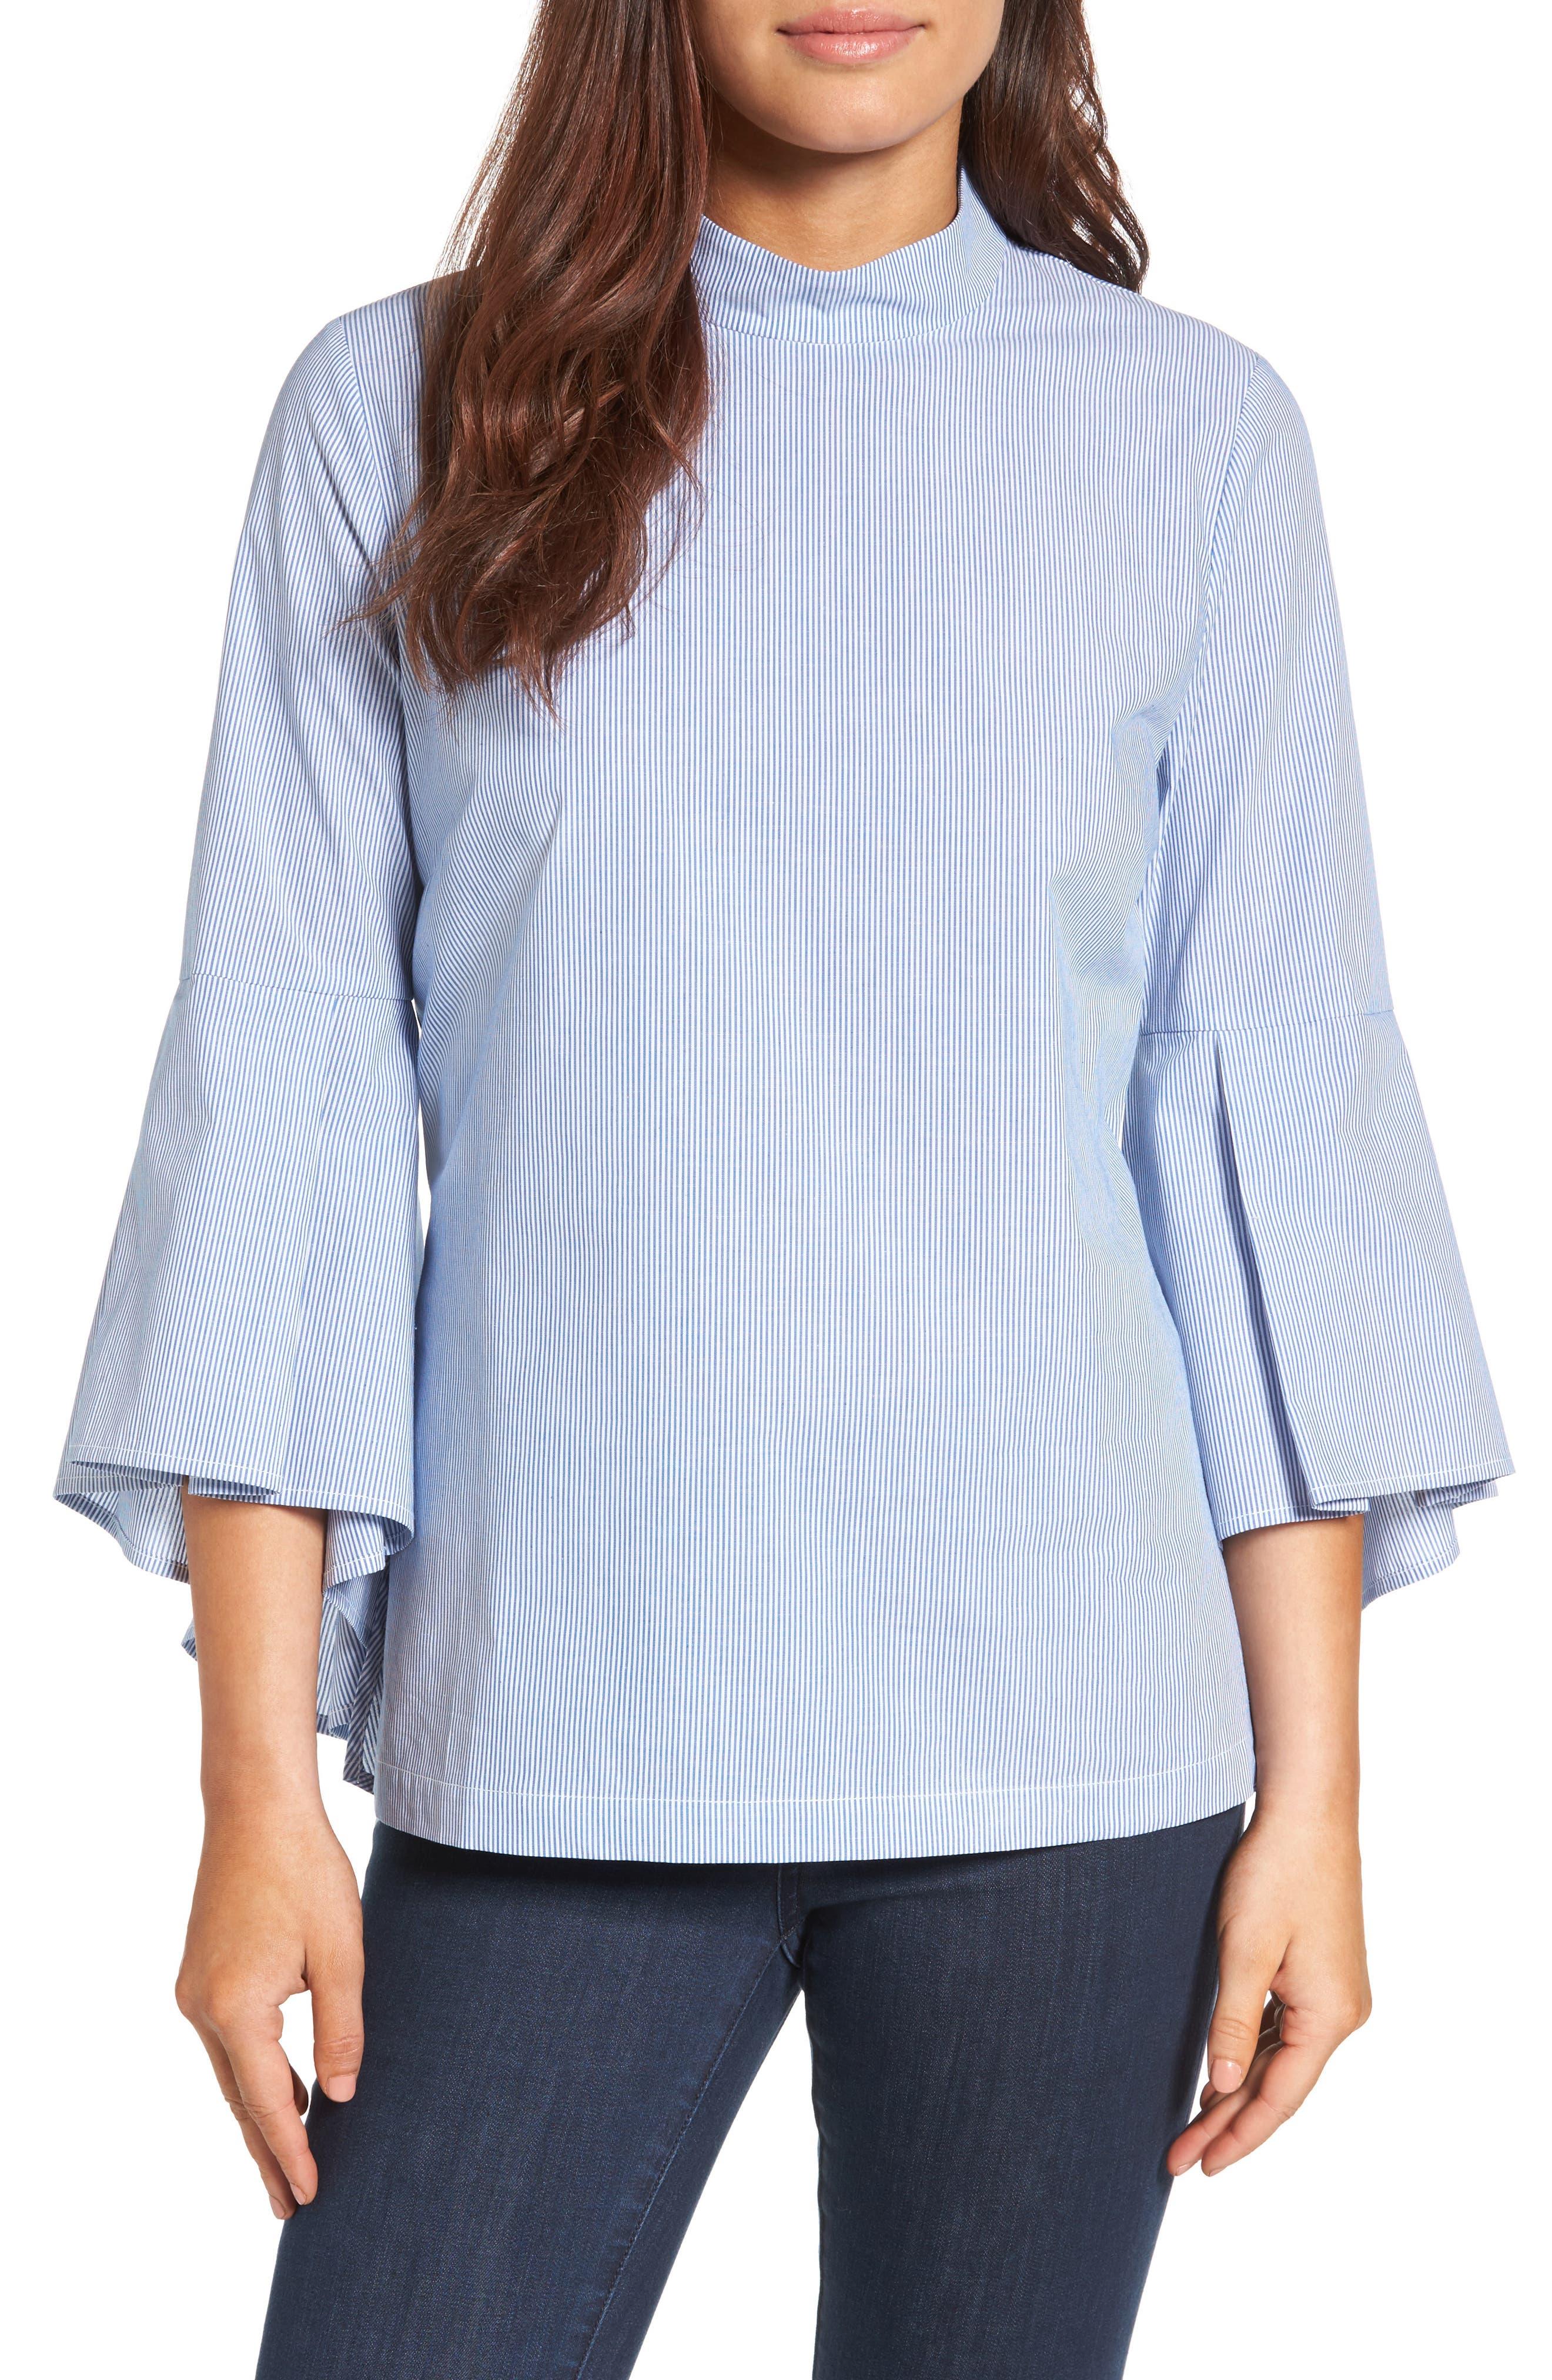 Ruffle Sleeve Poplin Shirt,                             Main thumbnail 1, color,                             Blue/ White Stripe